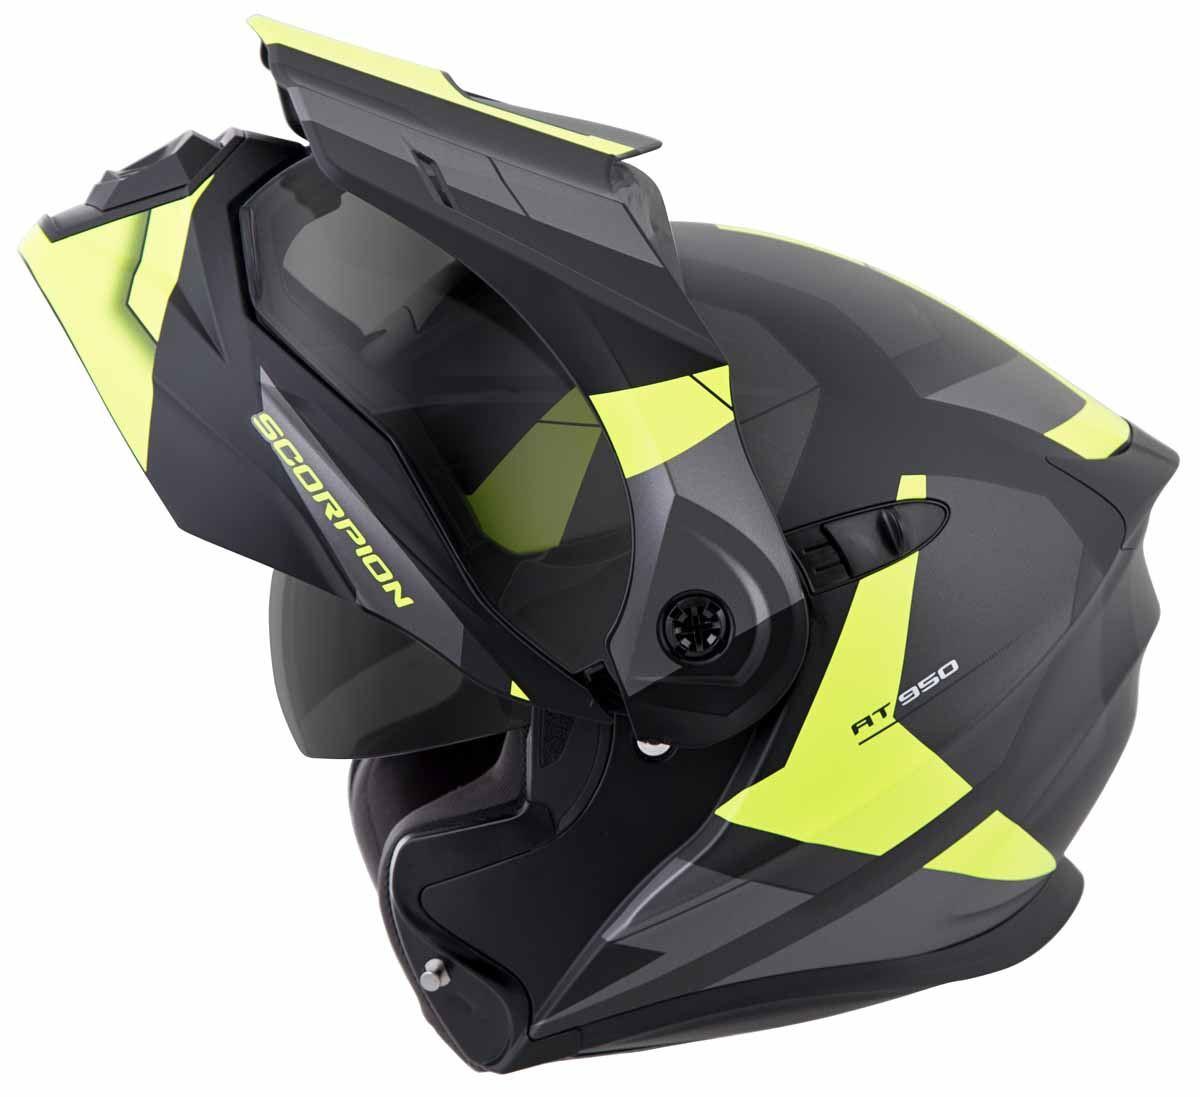 Scorpion-EXO-AT950-Helmet-Flip-Up-Modular-Dual-Sport-Adventure-ADV-DOT-XS-3XL miniature 37